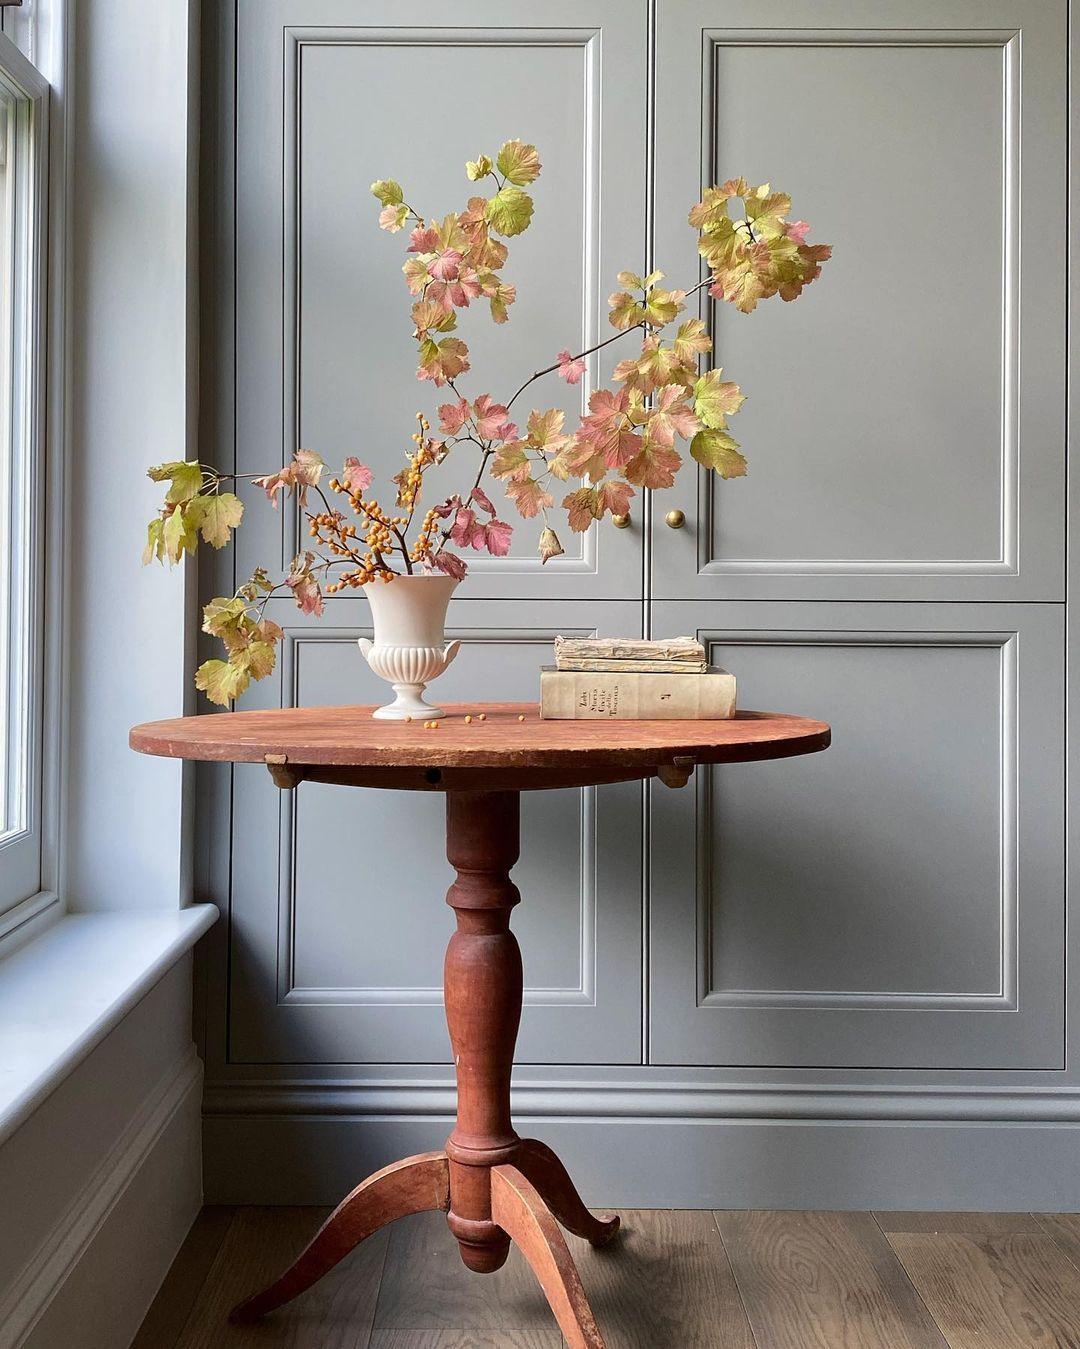 "Victoria Davar on Instagram: ""Autumn invited inside...✨ . . . #sundaystyle #floraldecor #antique #swedishantiques #antiques #table #tablescapes #antiquedecor…"""